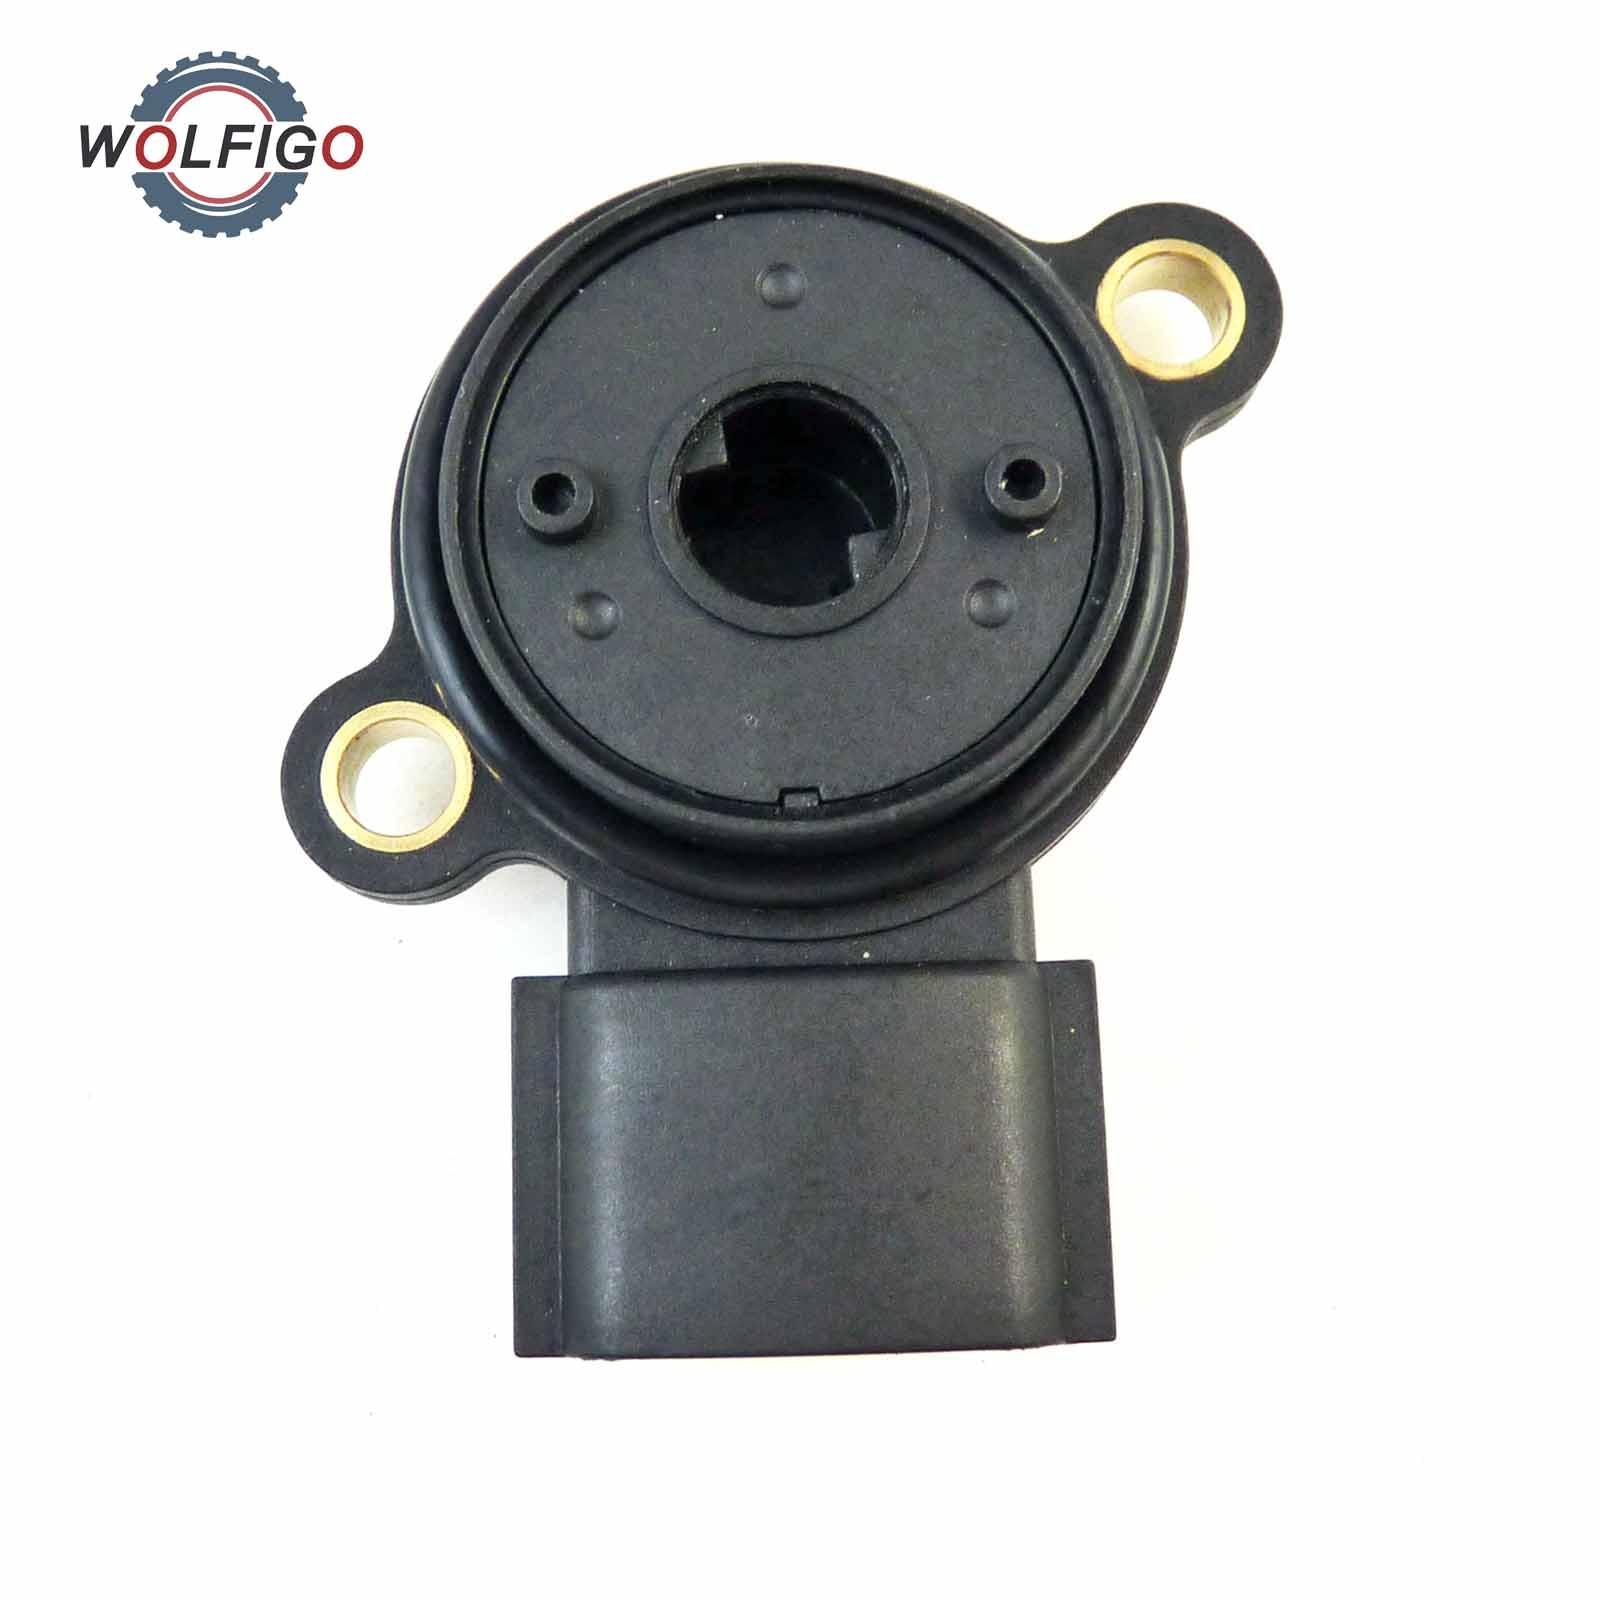 Sensor de ángulo WLFIGO y anillo redondo para Honda TRX500FA TRX400FA Rancher FGA 06380-HN2-305 nuevo